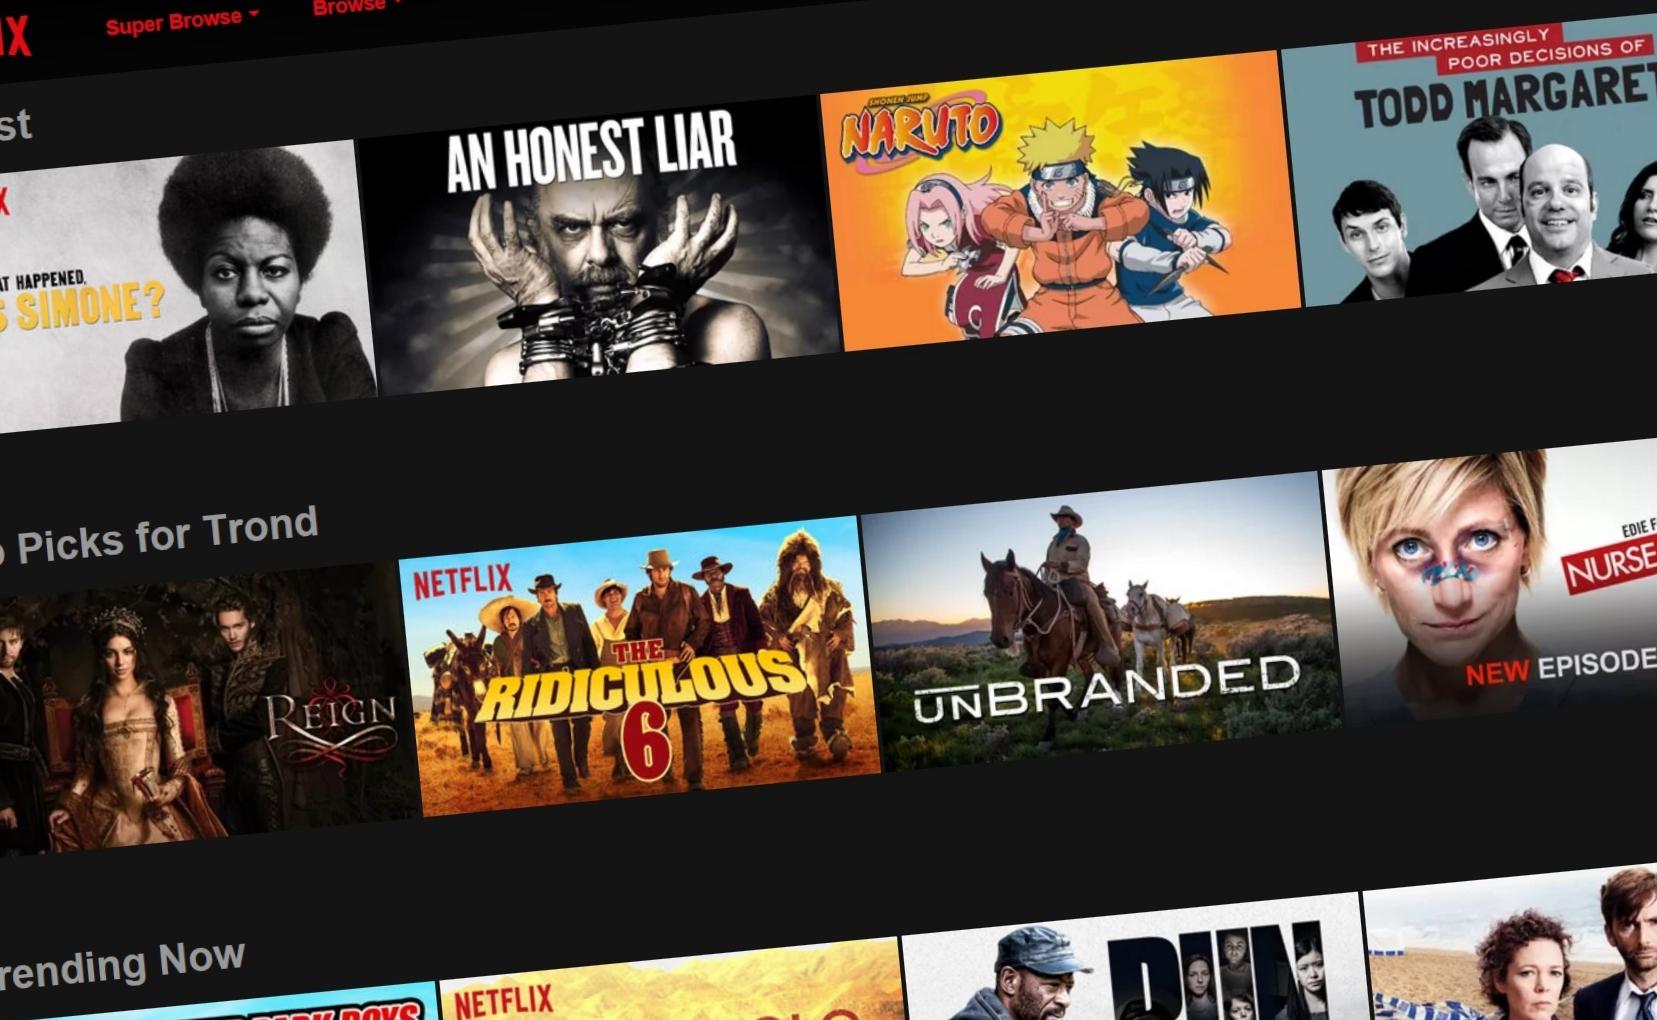 Netflix vokser på seg problemer.